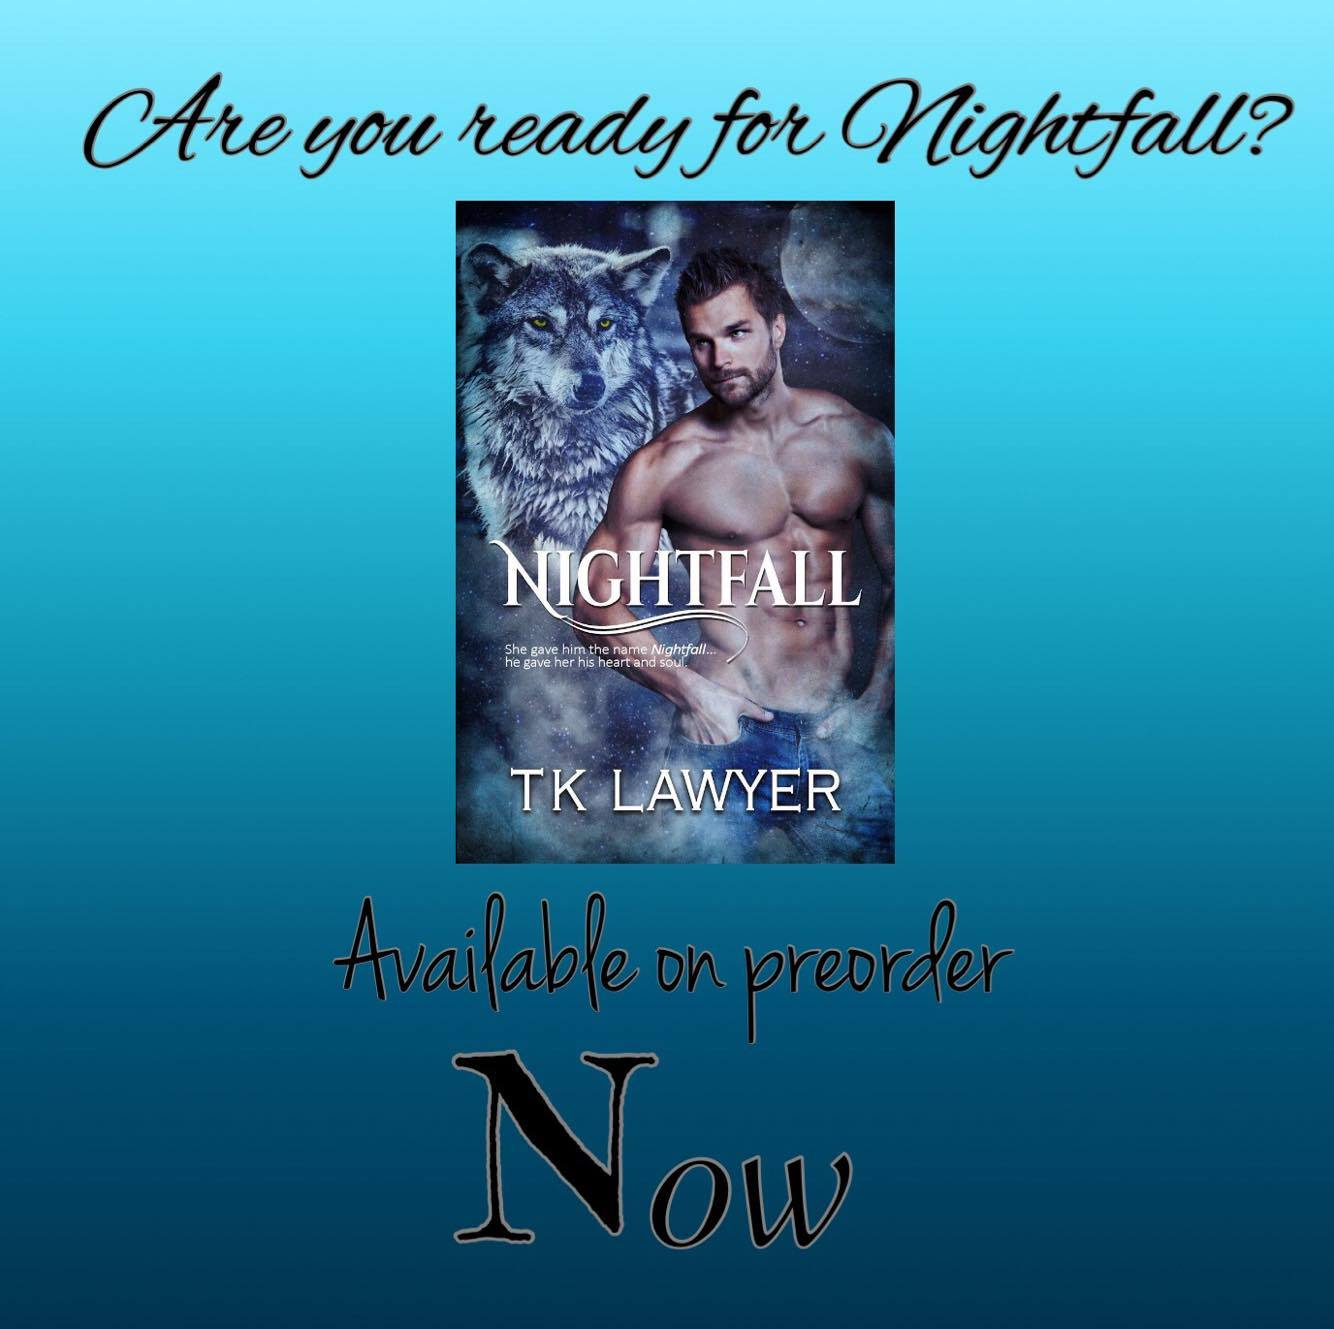 Nightfall- Pre-order available